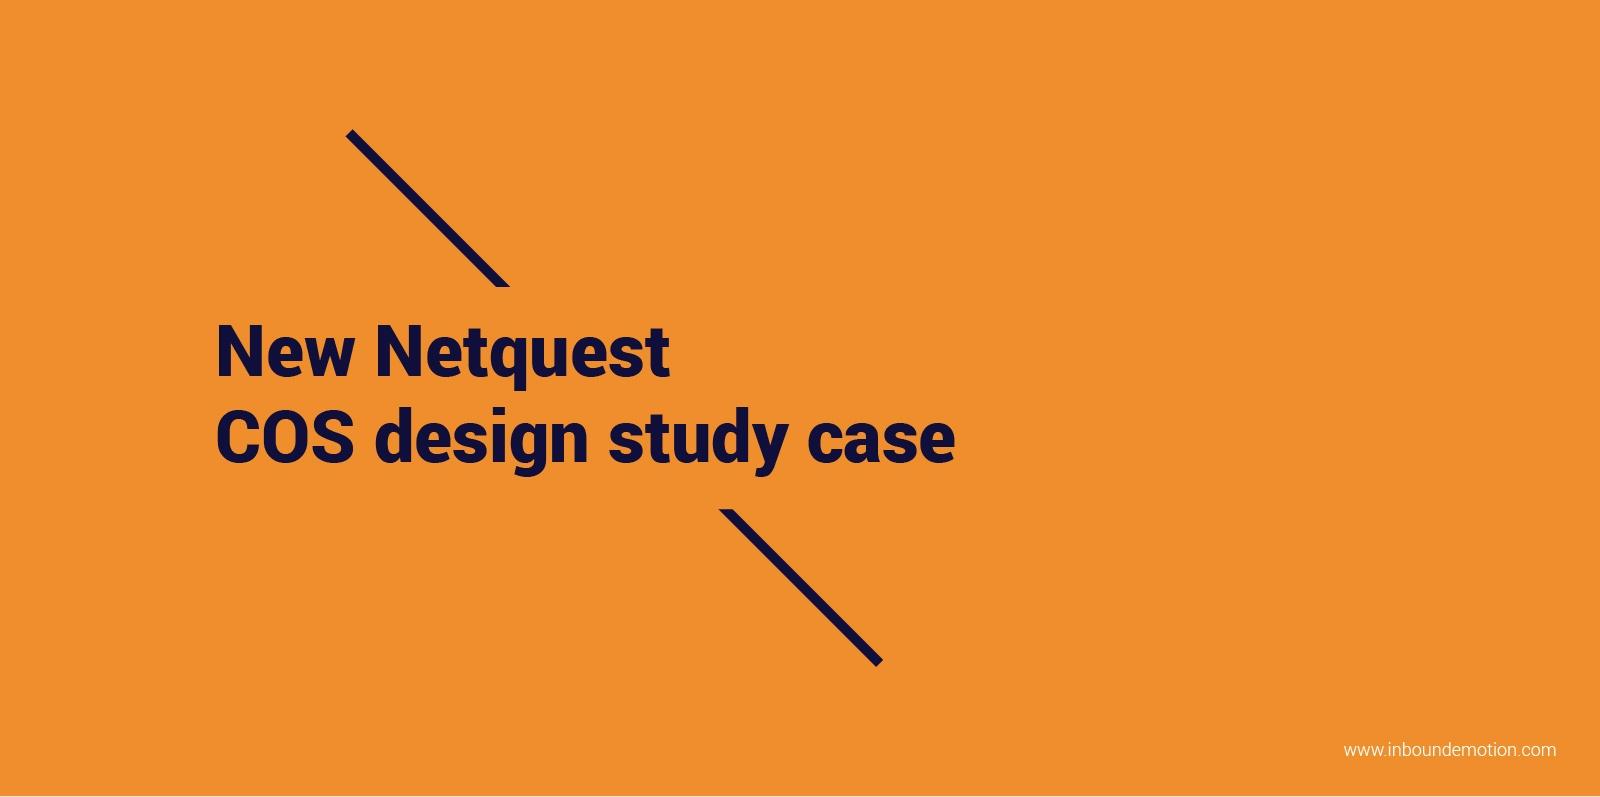 New-Netquest-COS-design-study-case-02.jpg